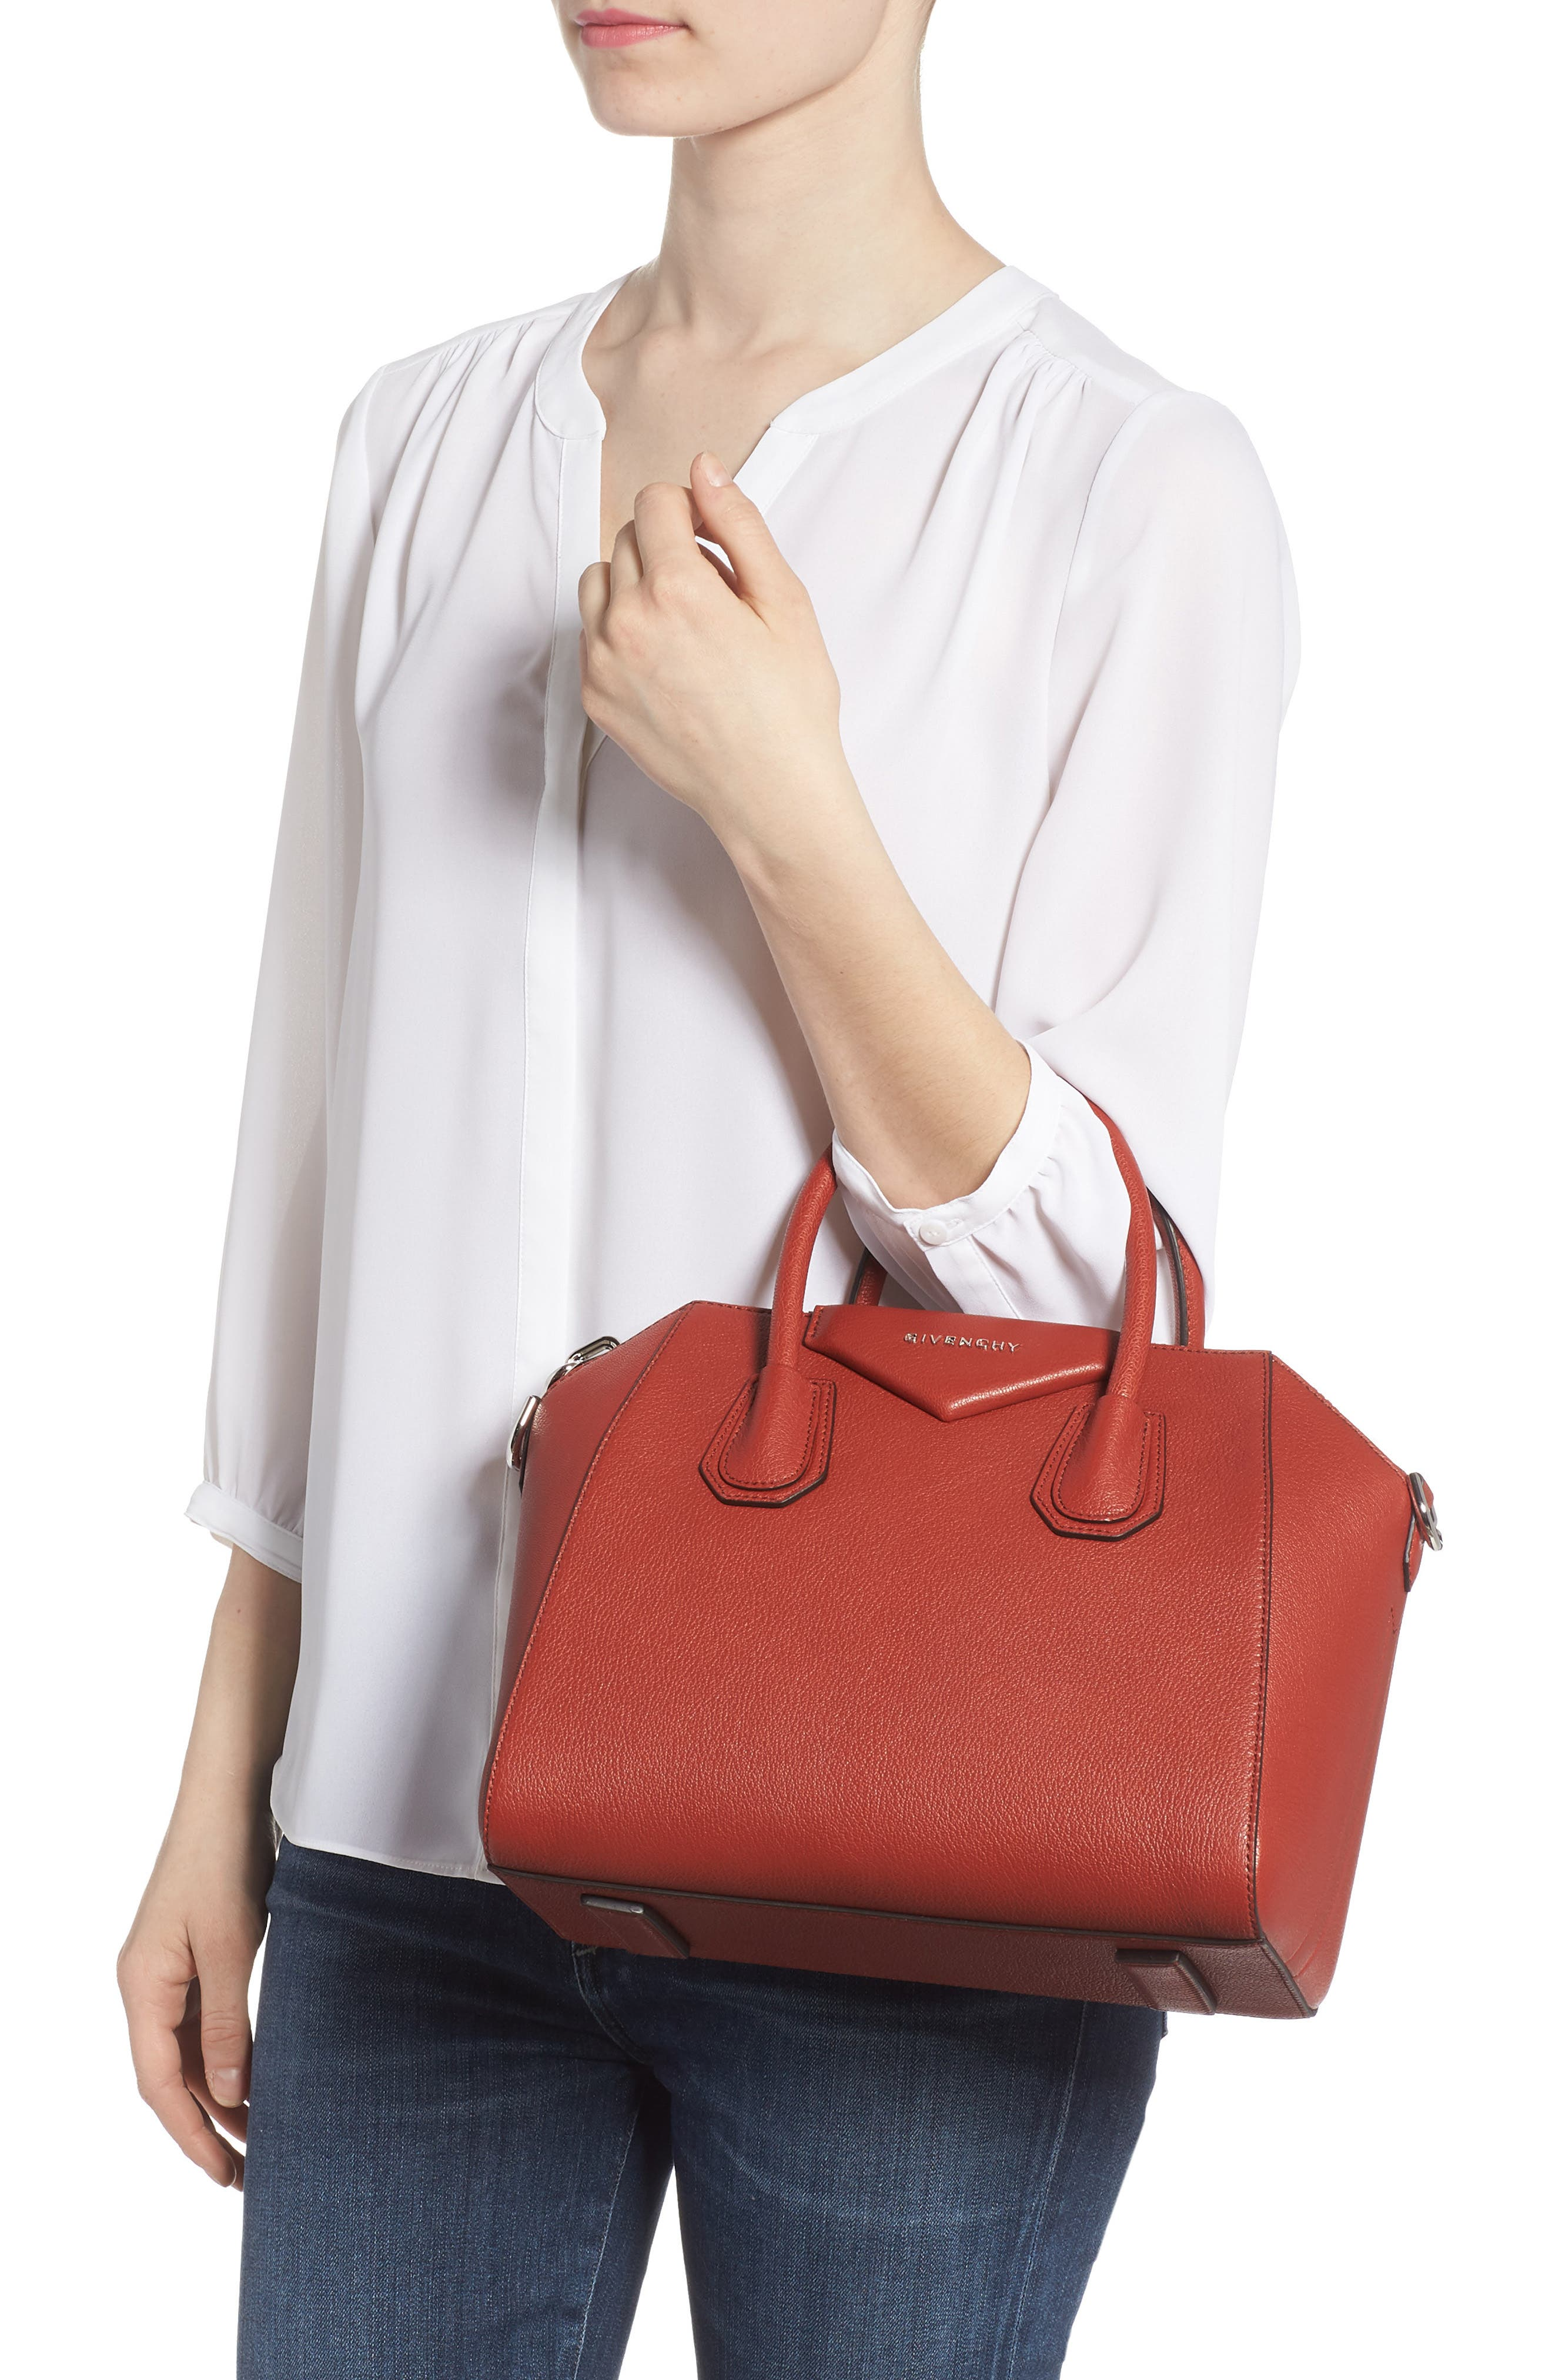 Alternate Image 2  - Givenchy 'Small Antigona' Leather Satchel